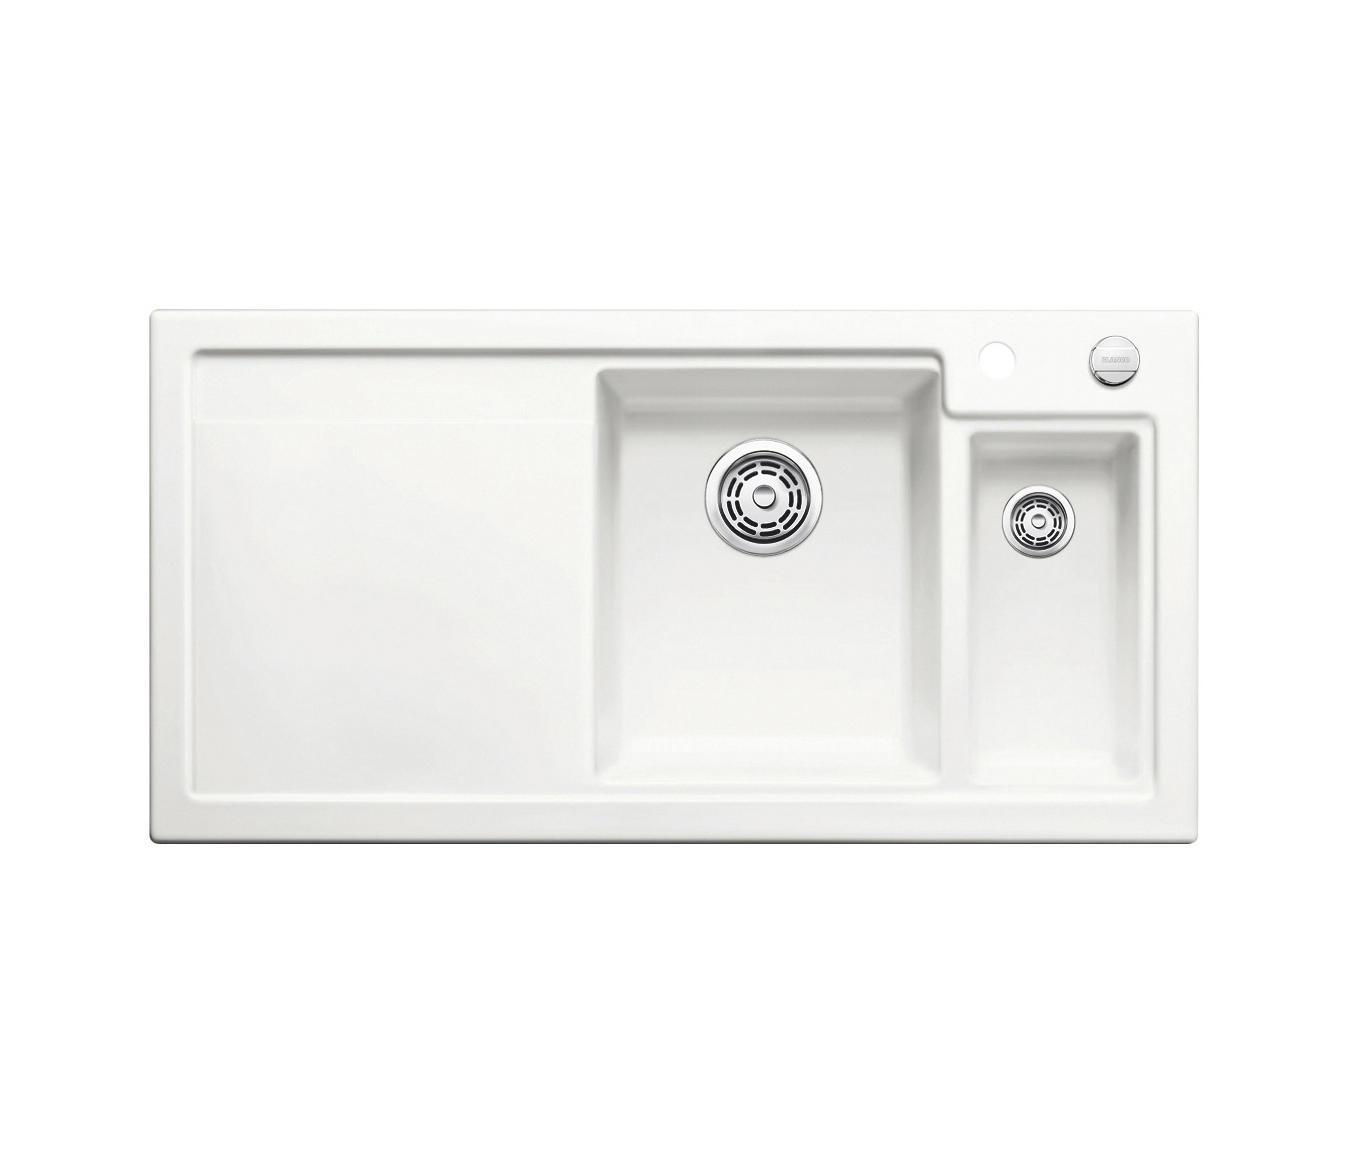 blanco axon ii 6 s keramik kristallweiss k chensp lbecken von blanco architonic. Black Bedroom Furniture Sets. Home Design Ideas